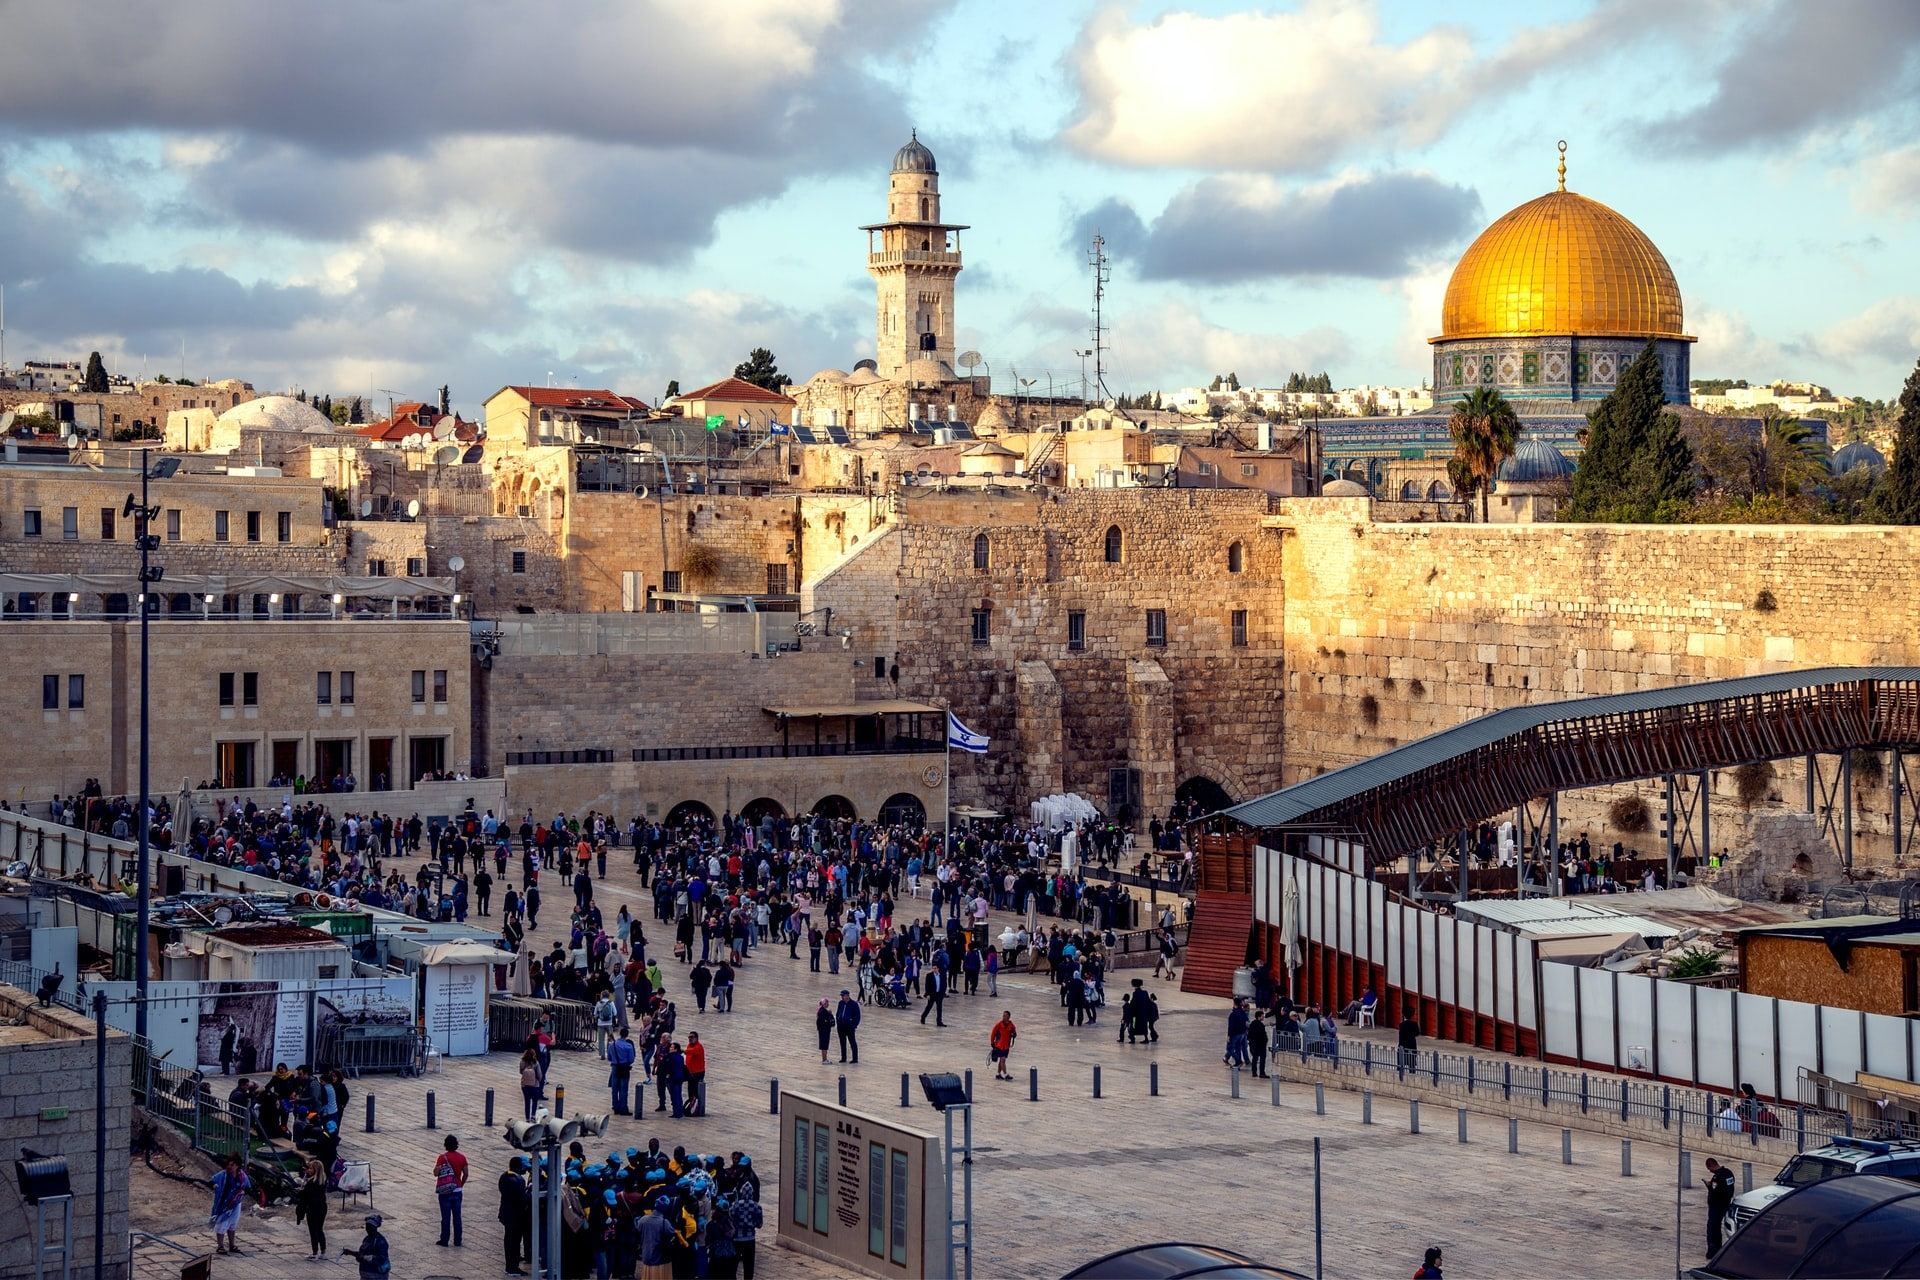 Western Wall, Jerusalem, Israel tours with Trafalgar